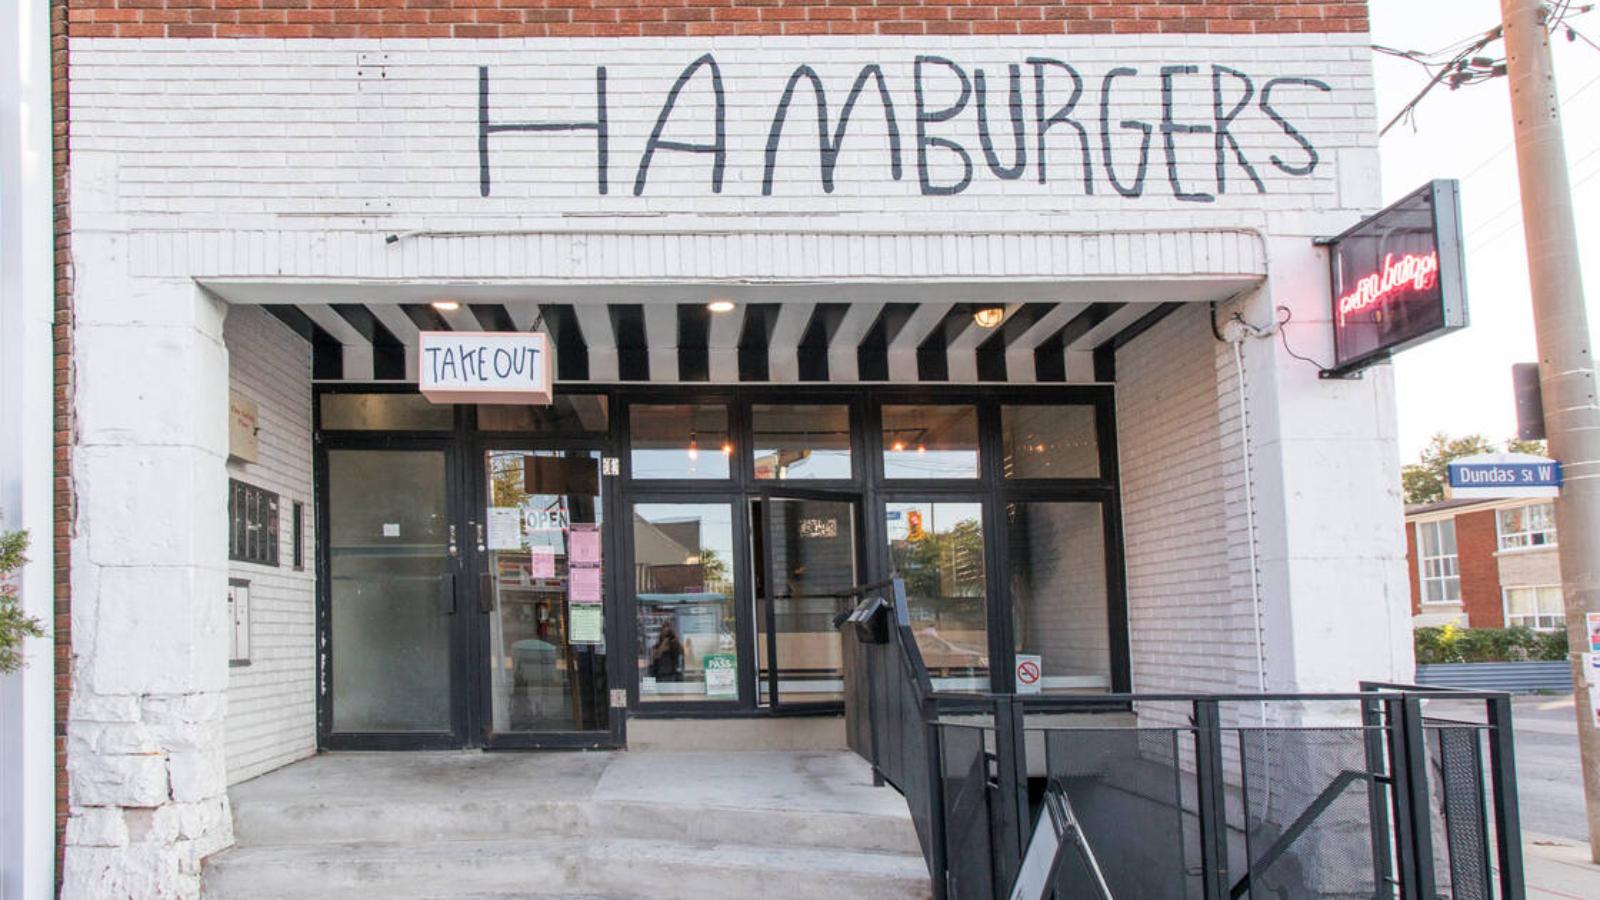 HAMBURGERS-ExtraBurger-1